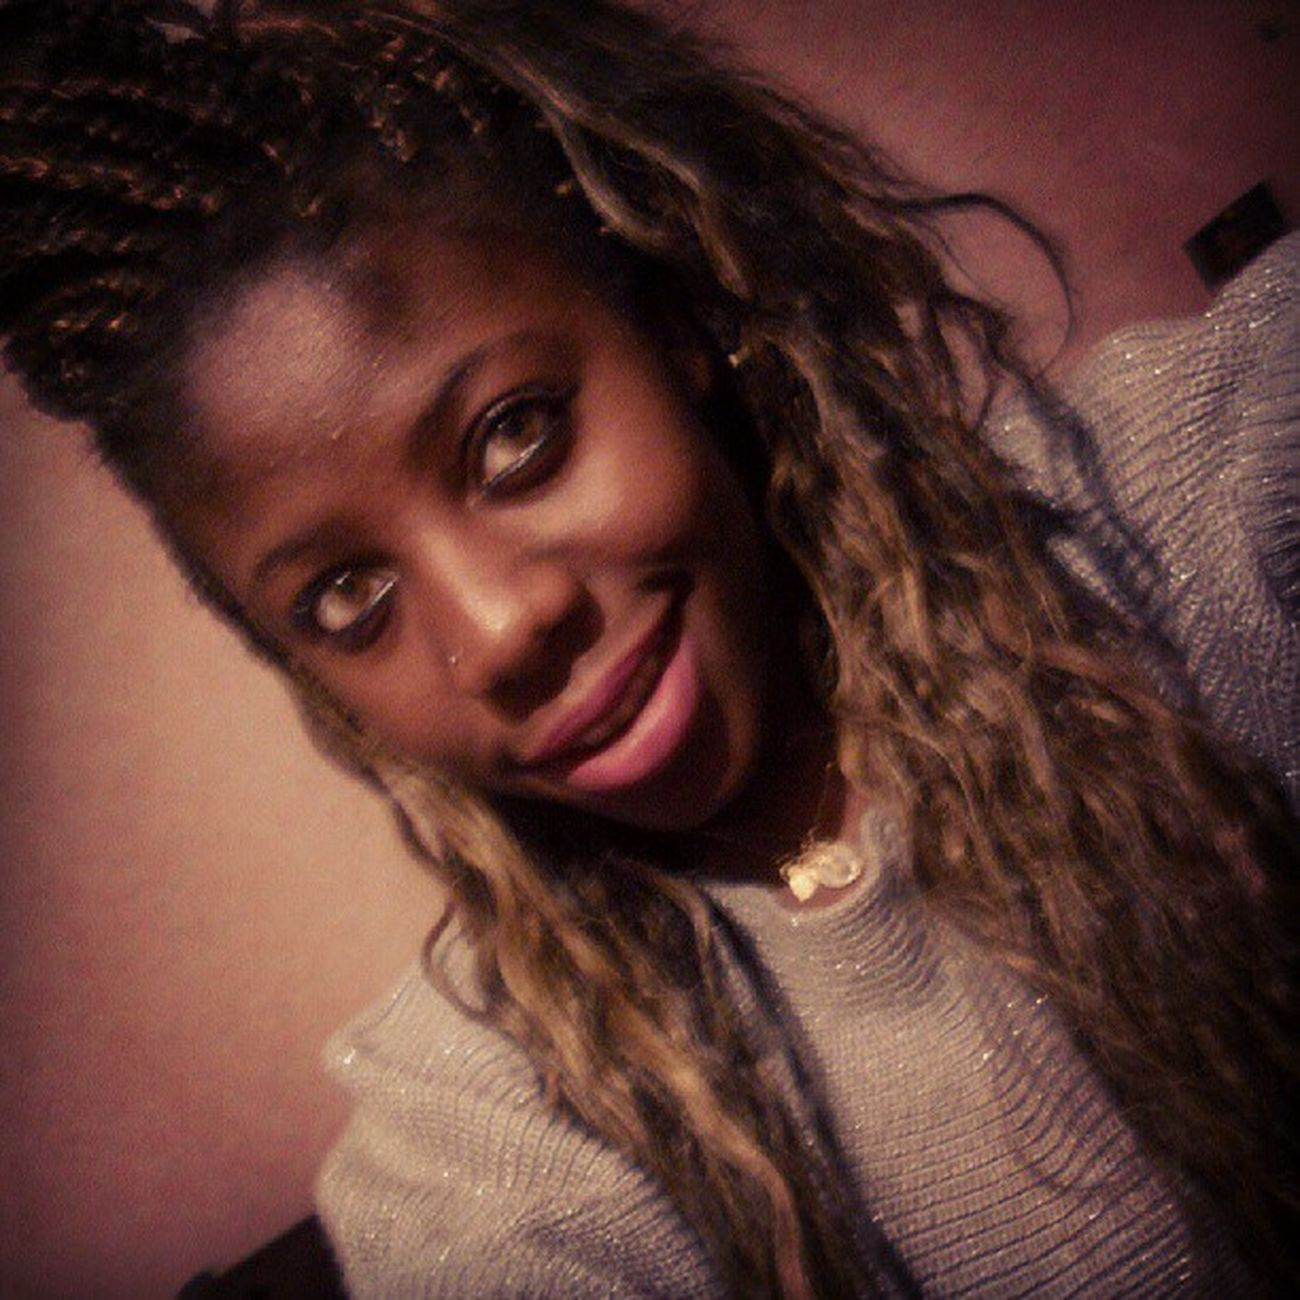 La France me manque . Merde Beautiful ♥ Blackgirl Guadeloupe